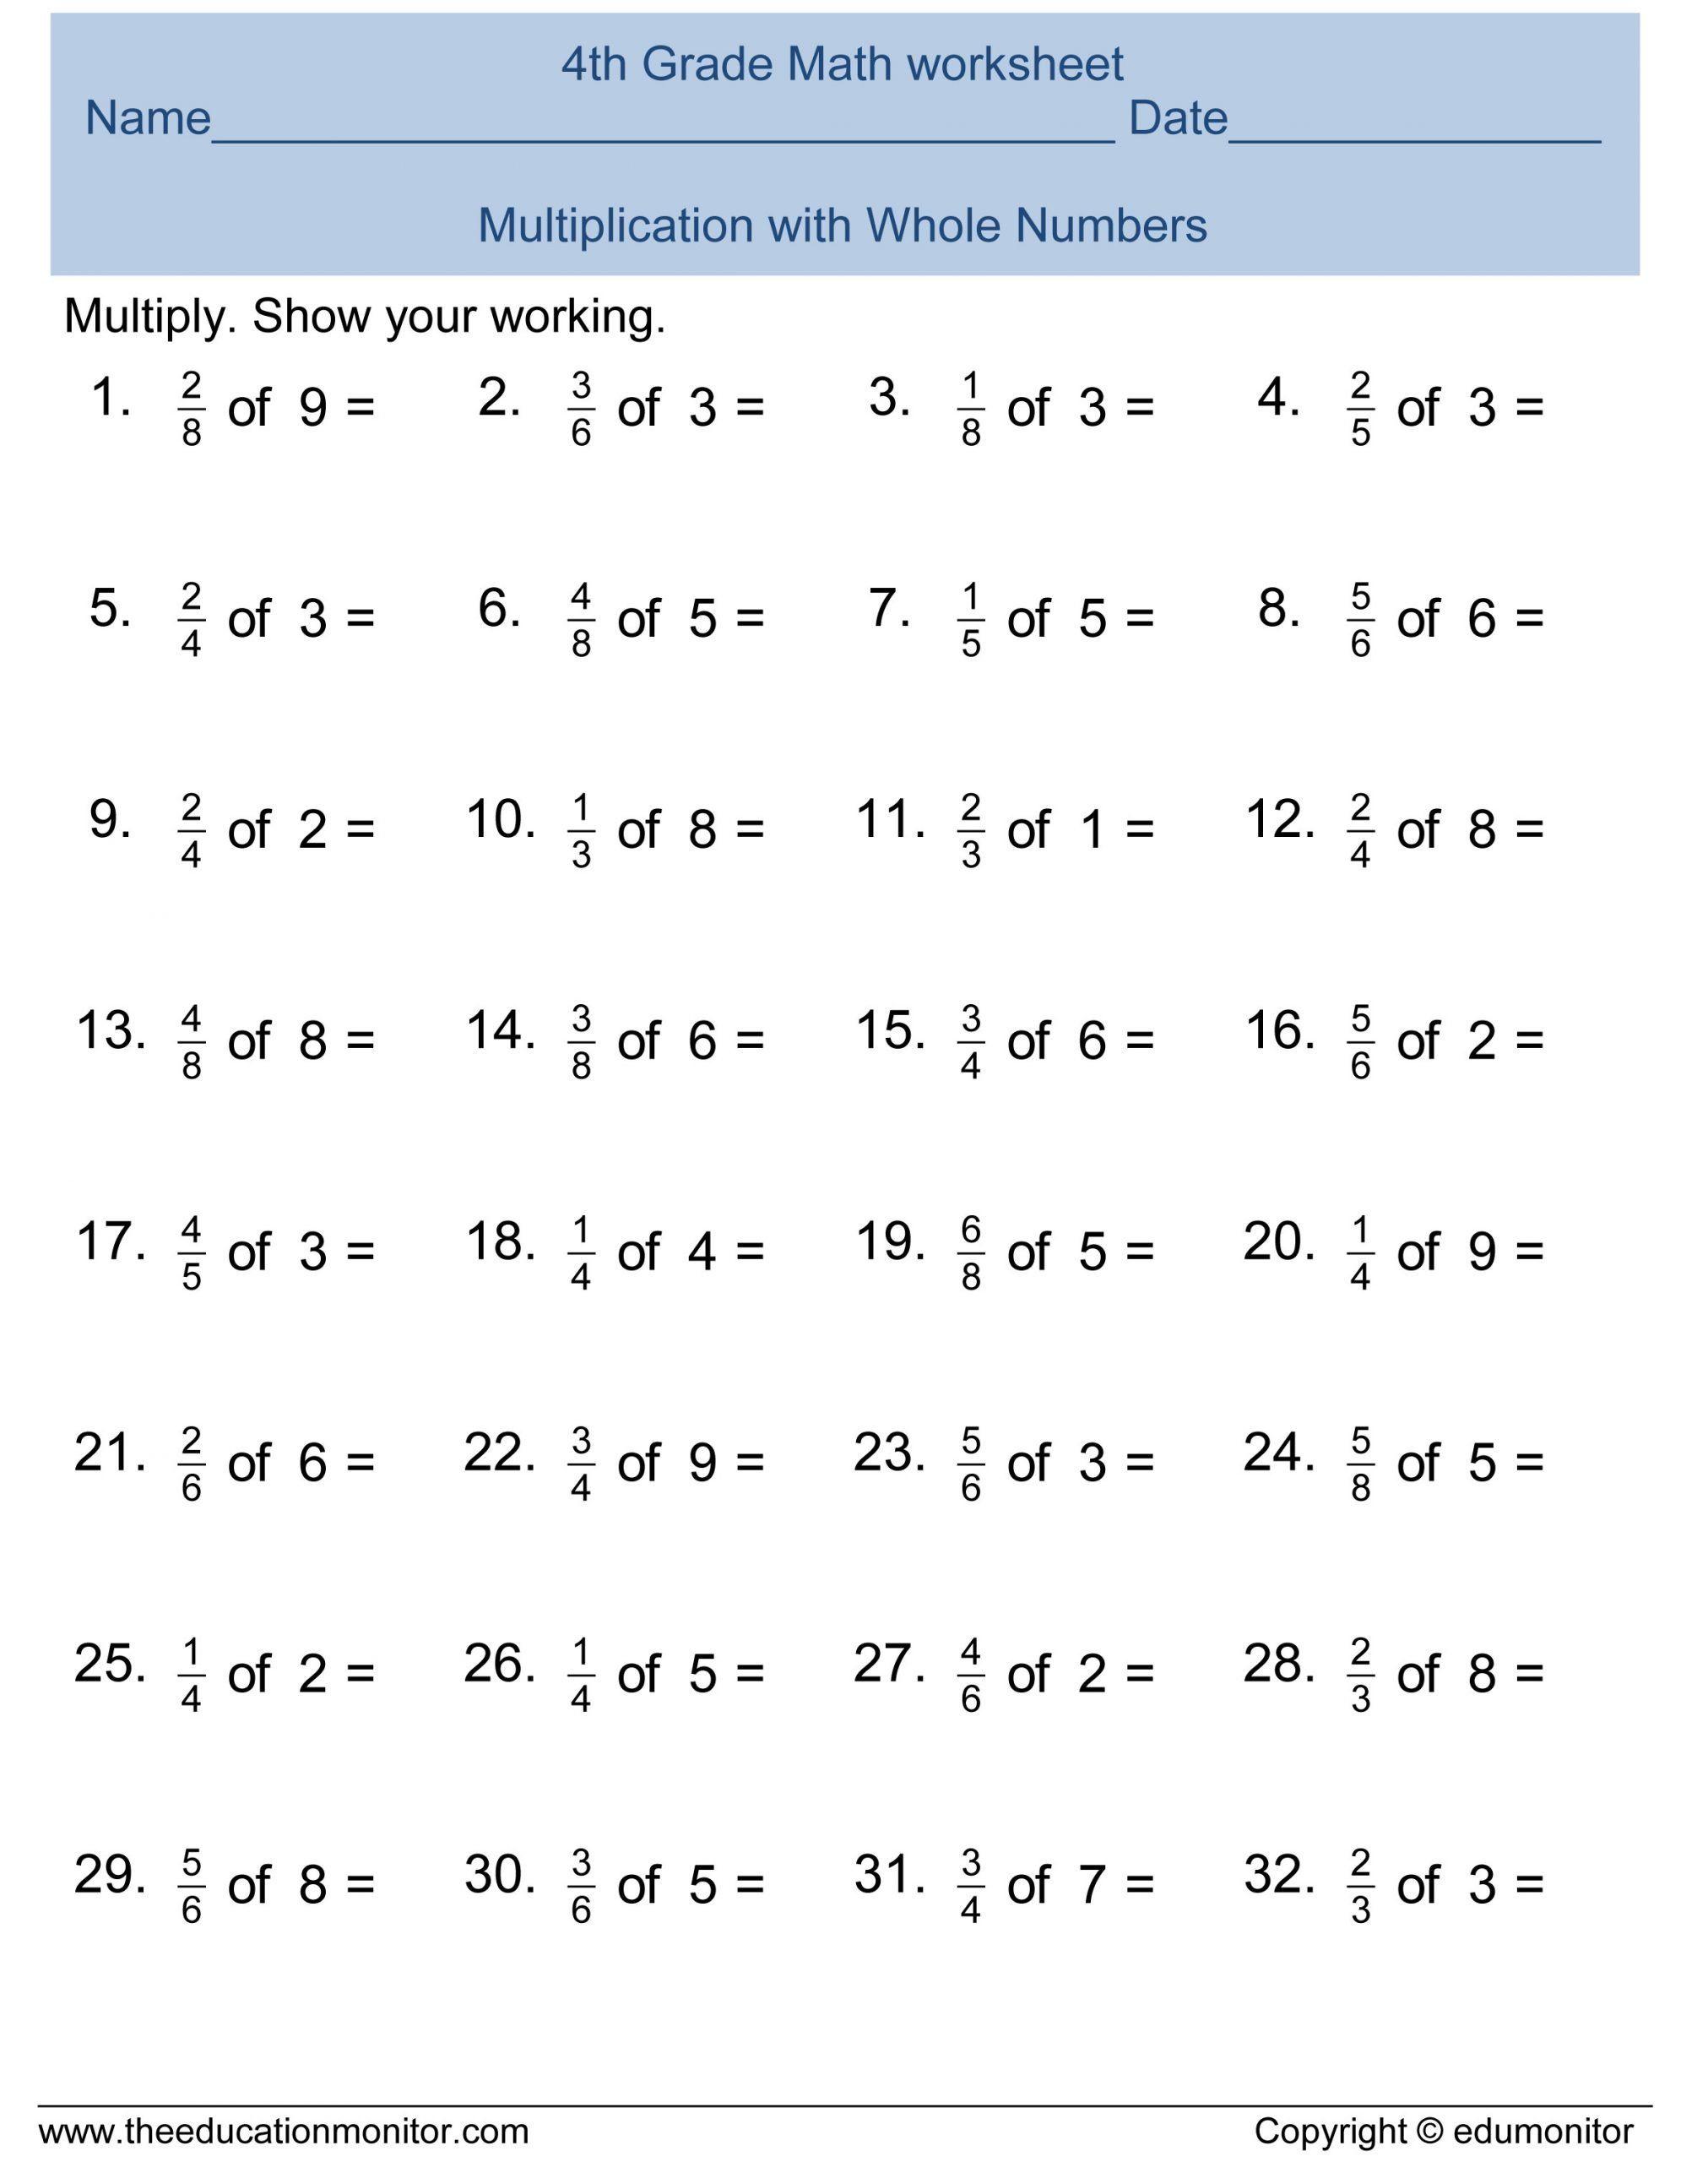 2nd Grade Fractions Worksheet Free 4th Grade Fractions